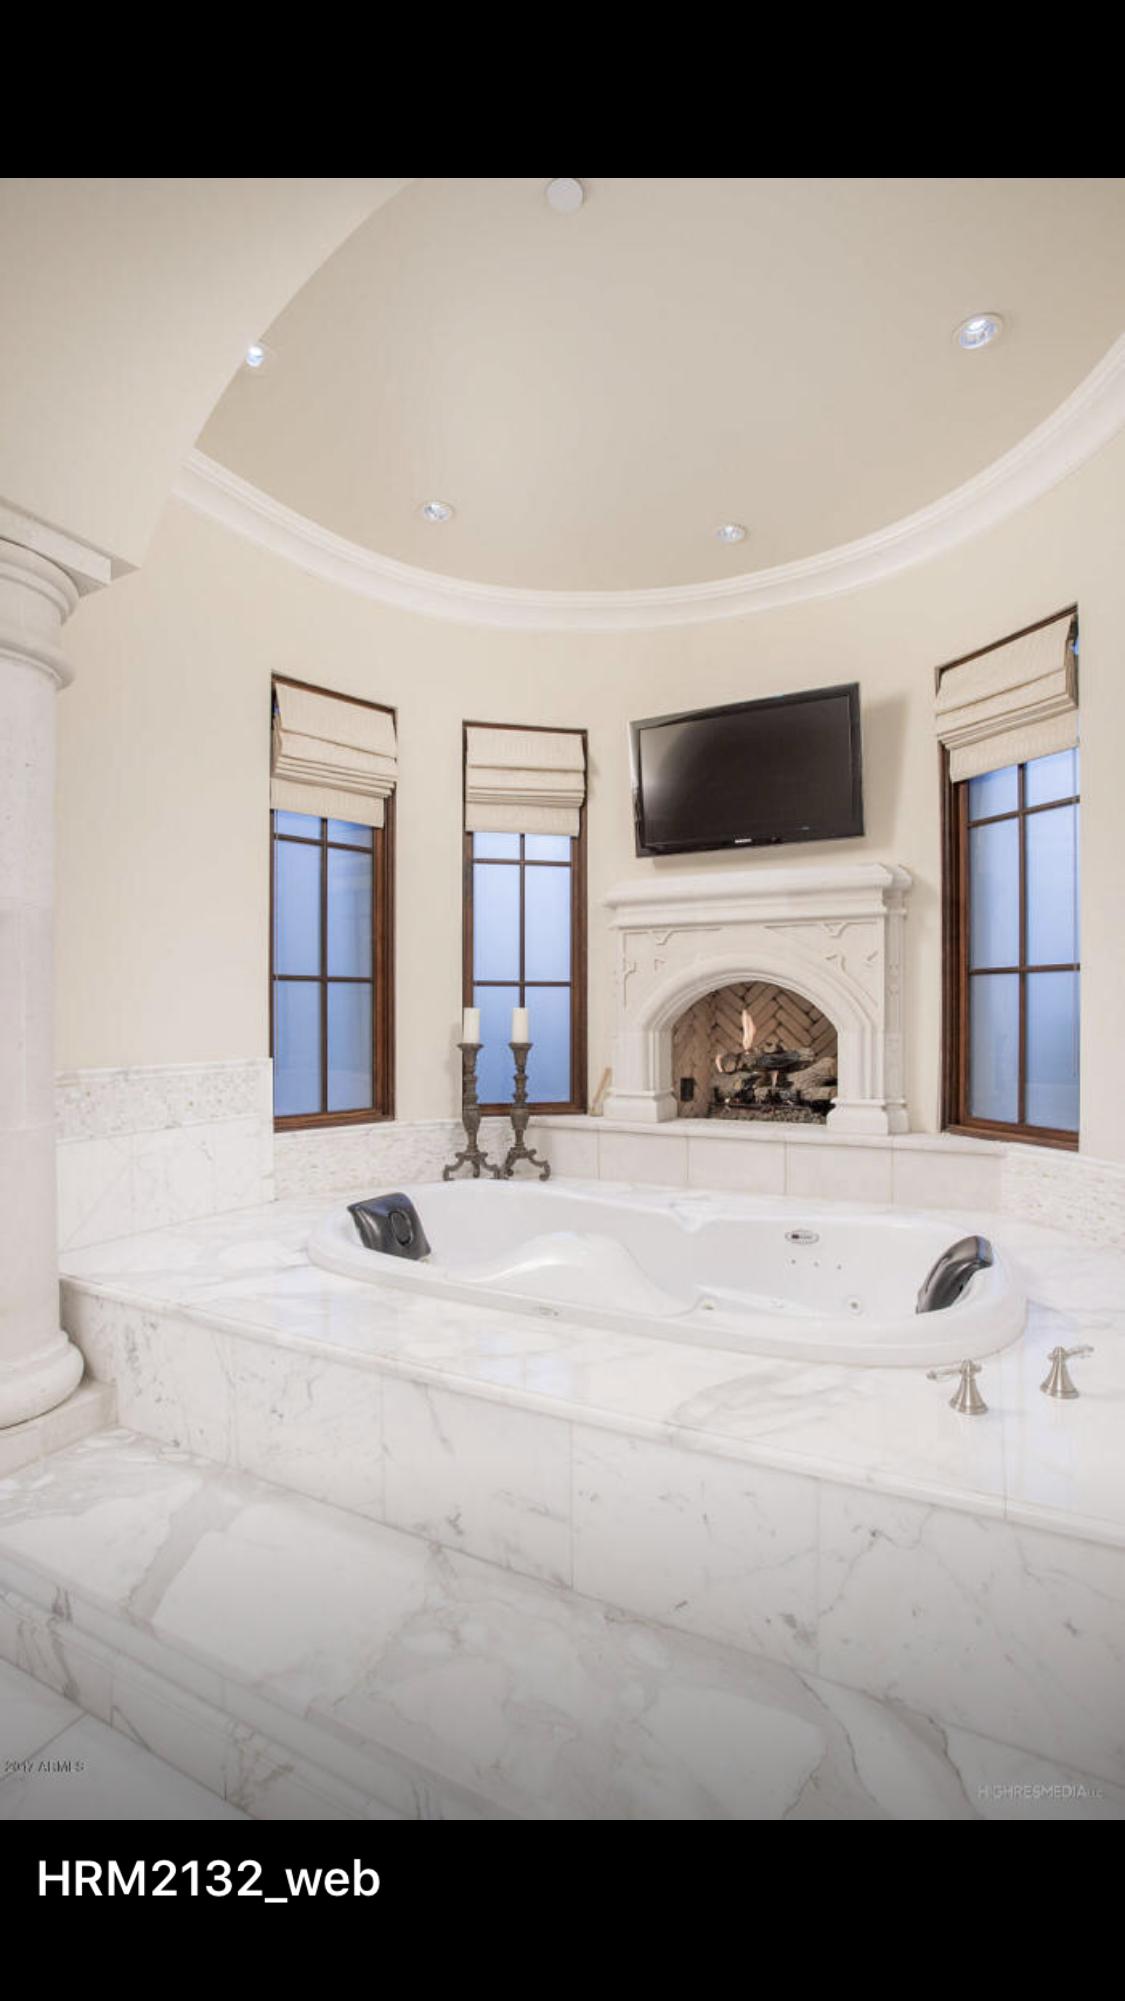 Luxurious bathtub | Beautiful Bathrooms | Pinterest | Bathtubs